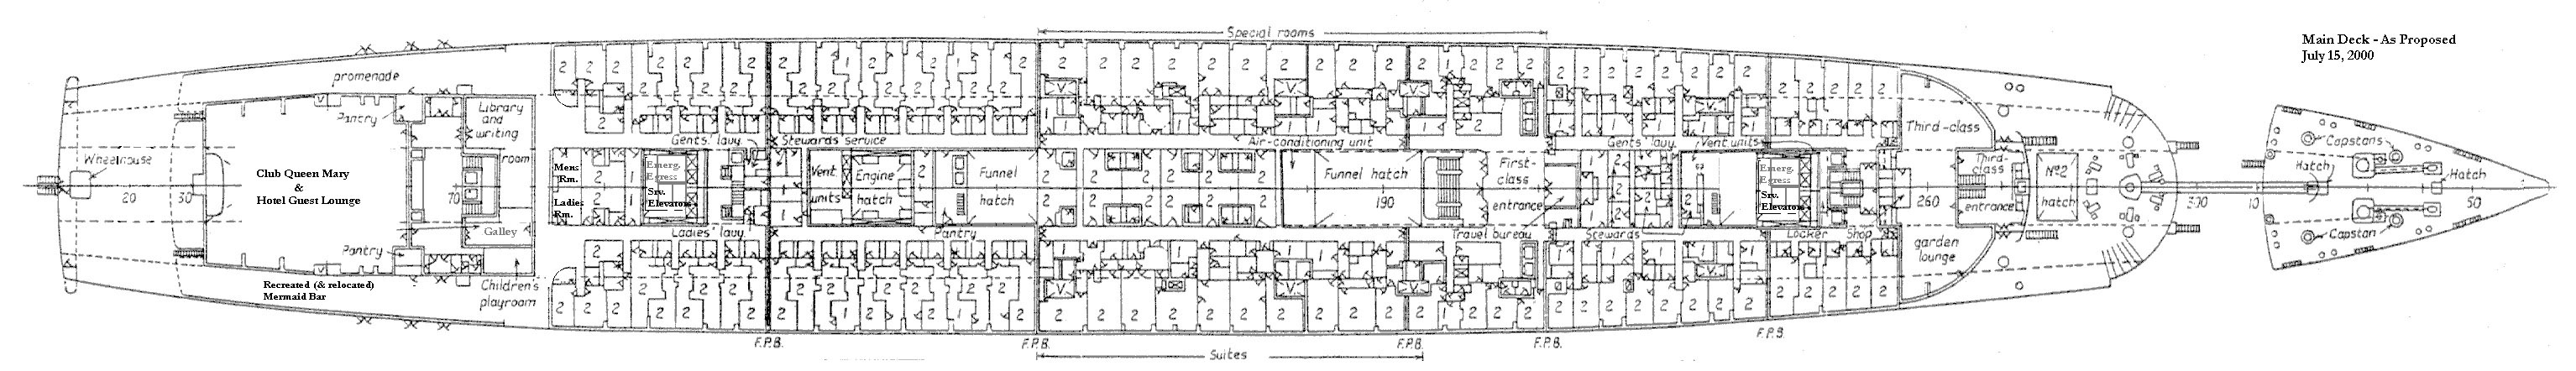 Queen mary deck by deck main deck baanklon Gallery